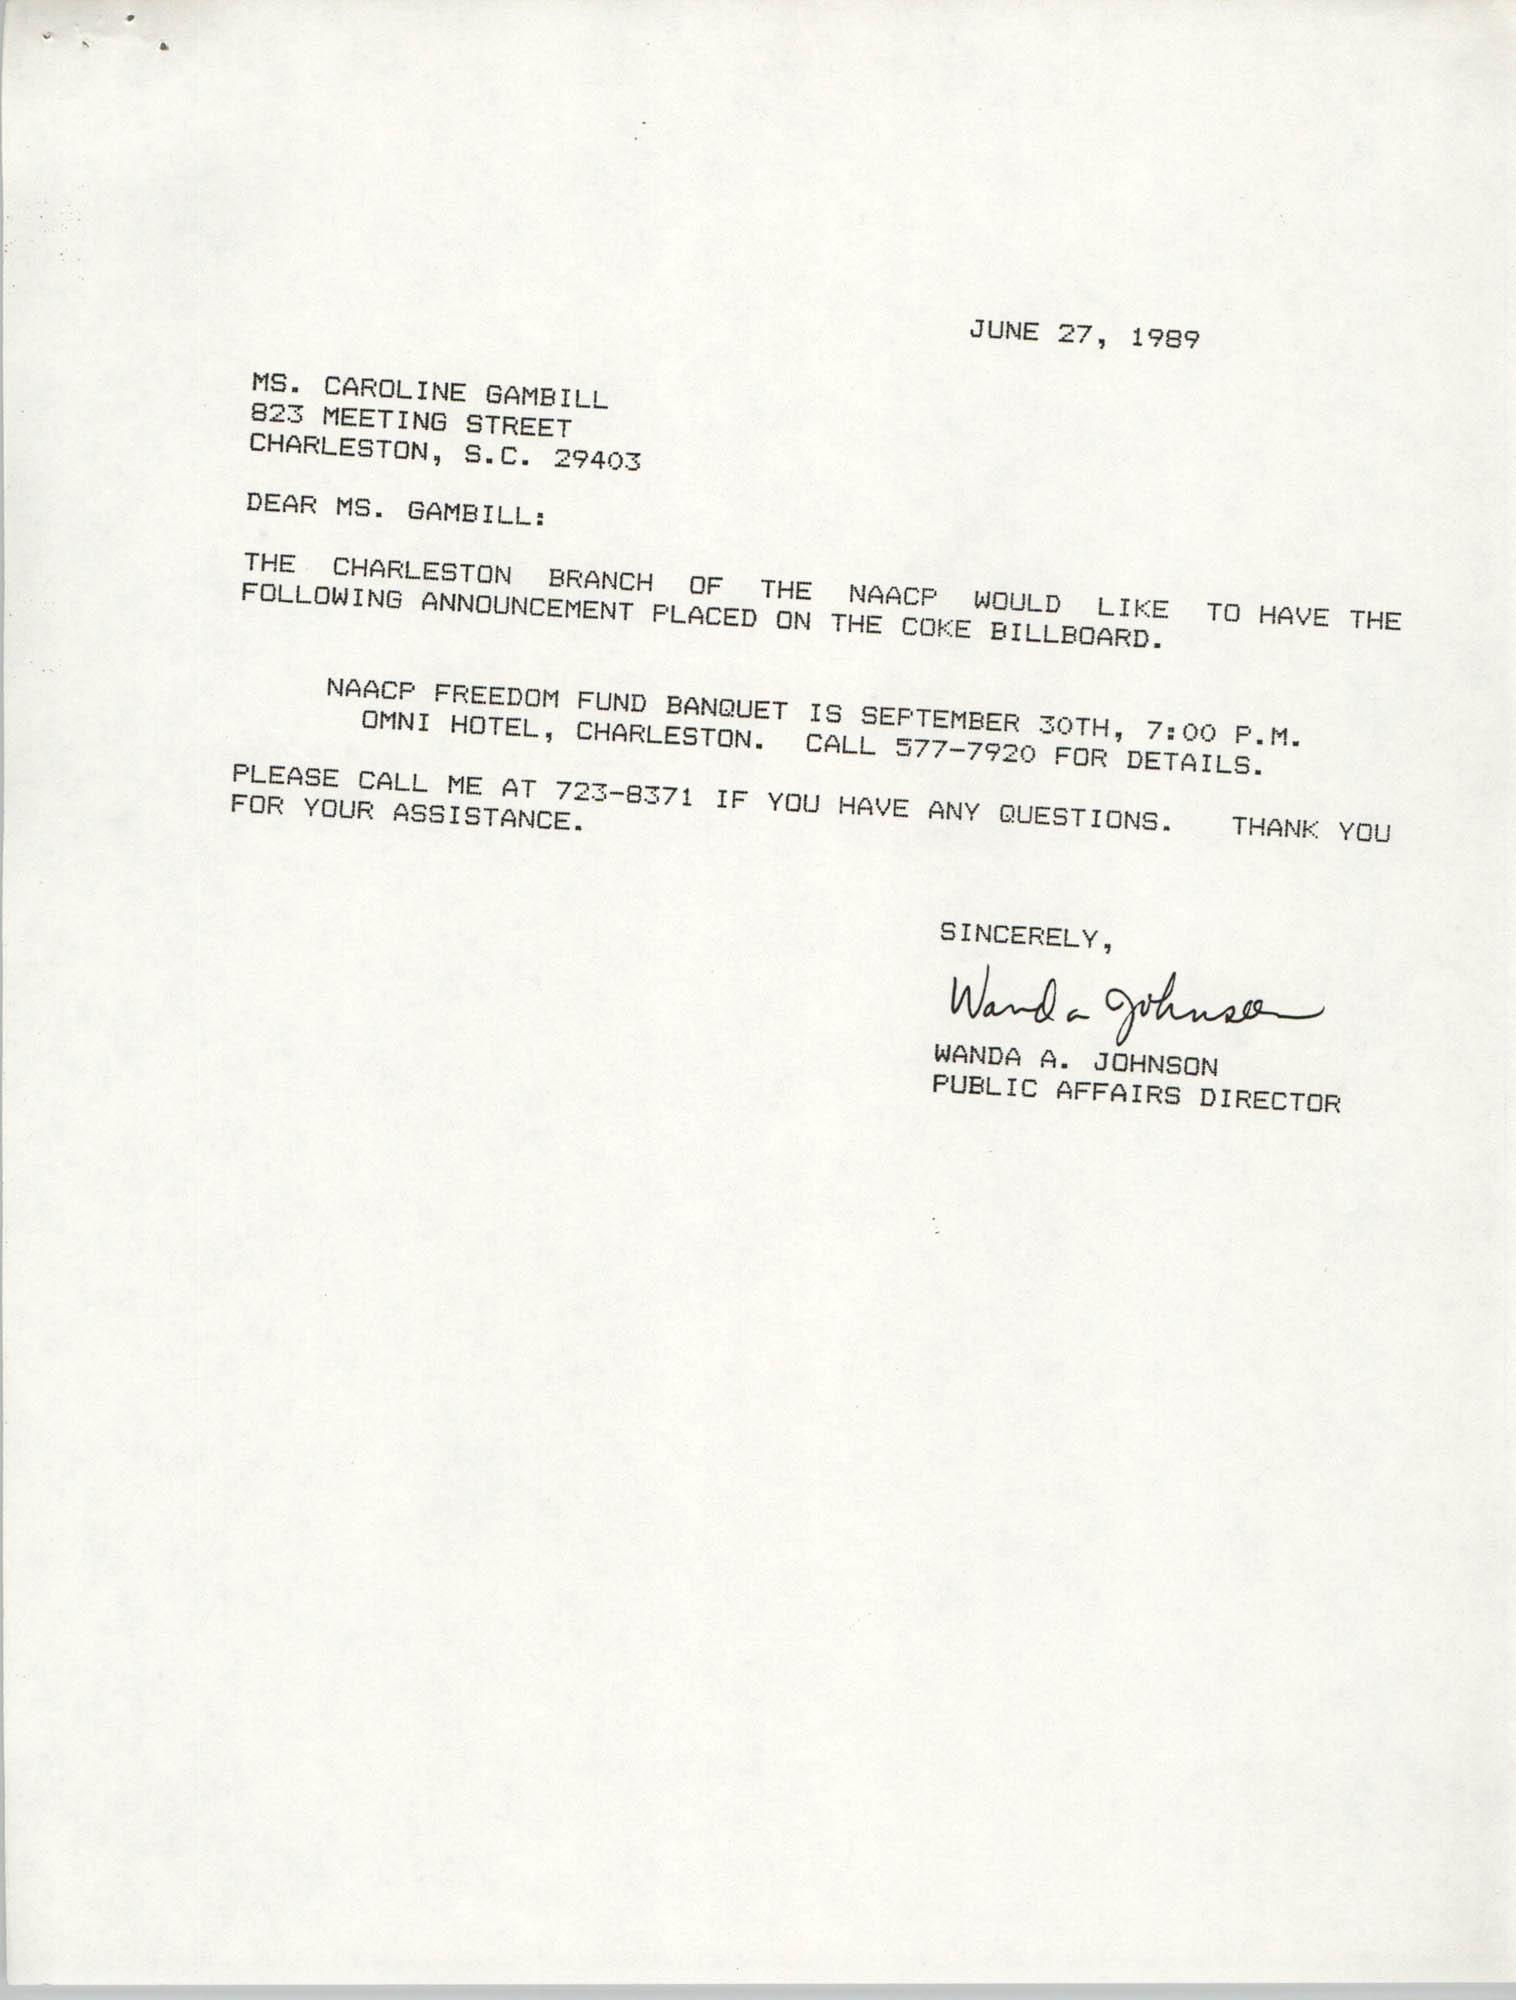 Letter from Wanda A. Johnson to Caroline Gambill, June 27, 1989